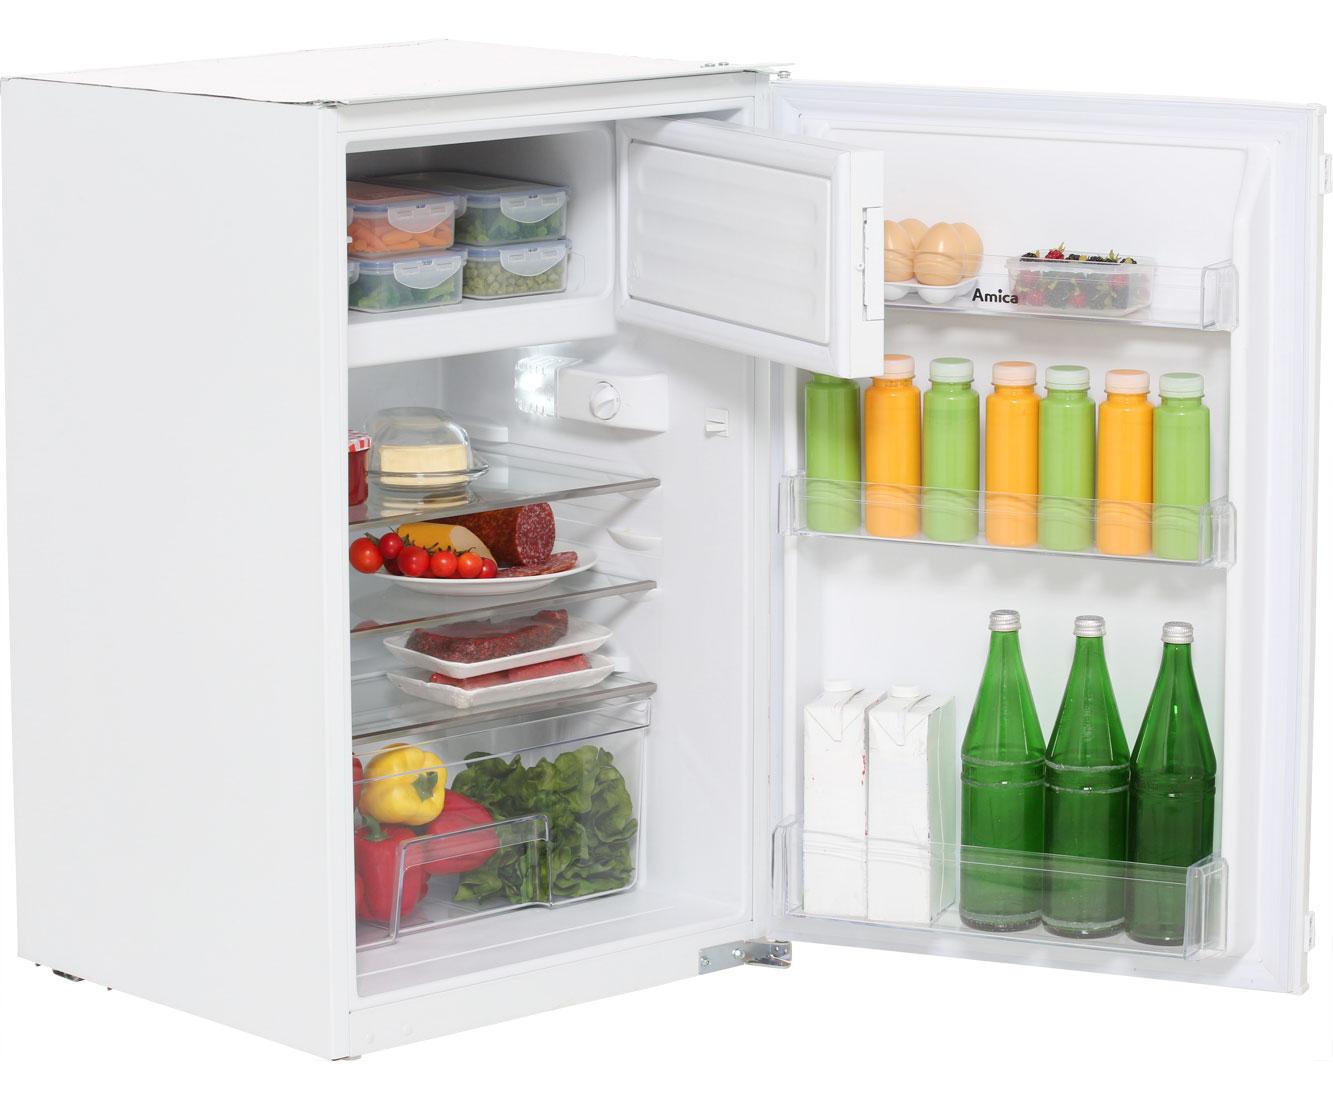 Amerikanischer Kühlschrank Türkis : Kühlschrank neu beko tse kühlschrank freistehend cm weiss